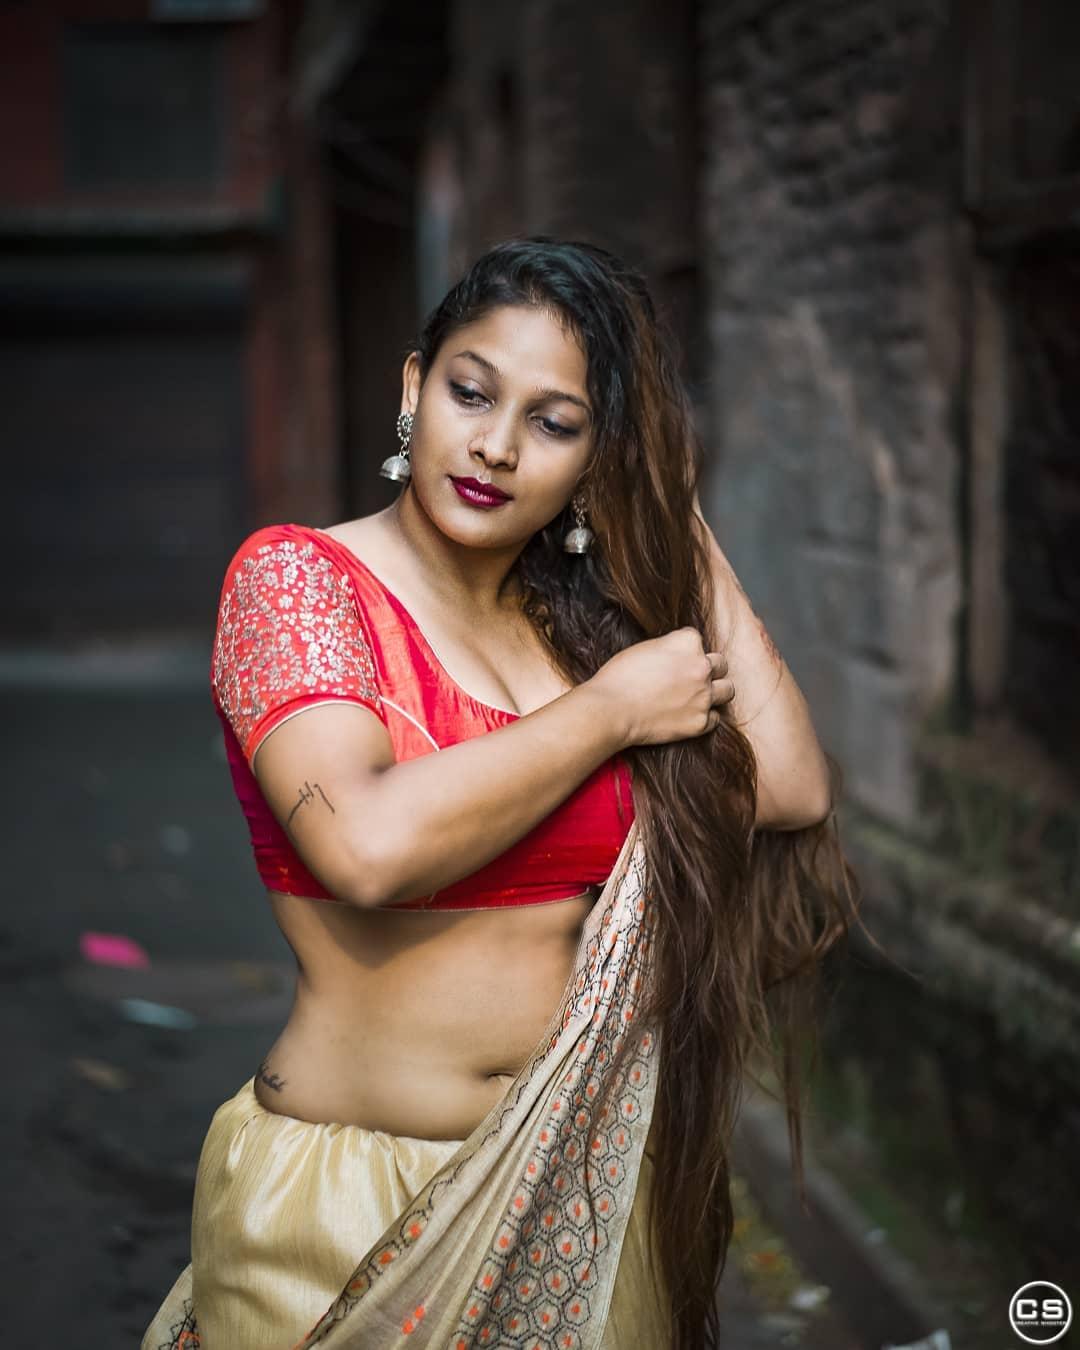 Underwood erotic sweet bengali girls video free streaming